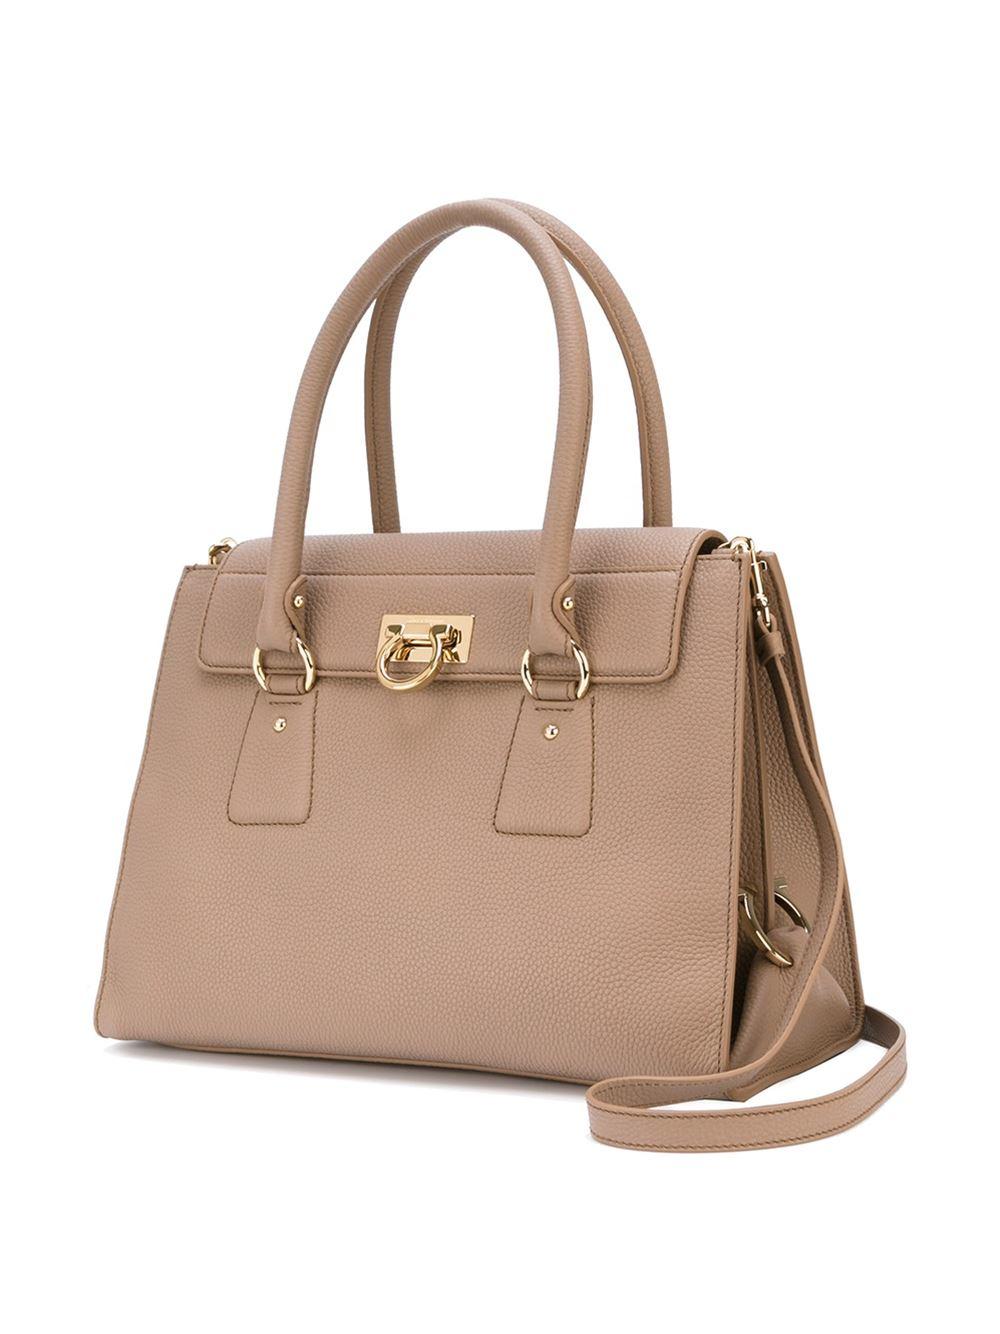 cc34dfe8aa13 Lyst - Ferragamo Lotty Bag in Natural